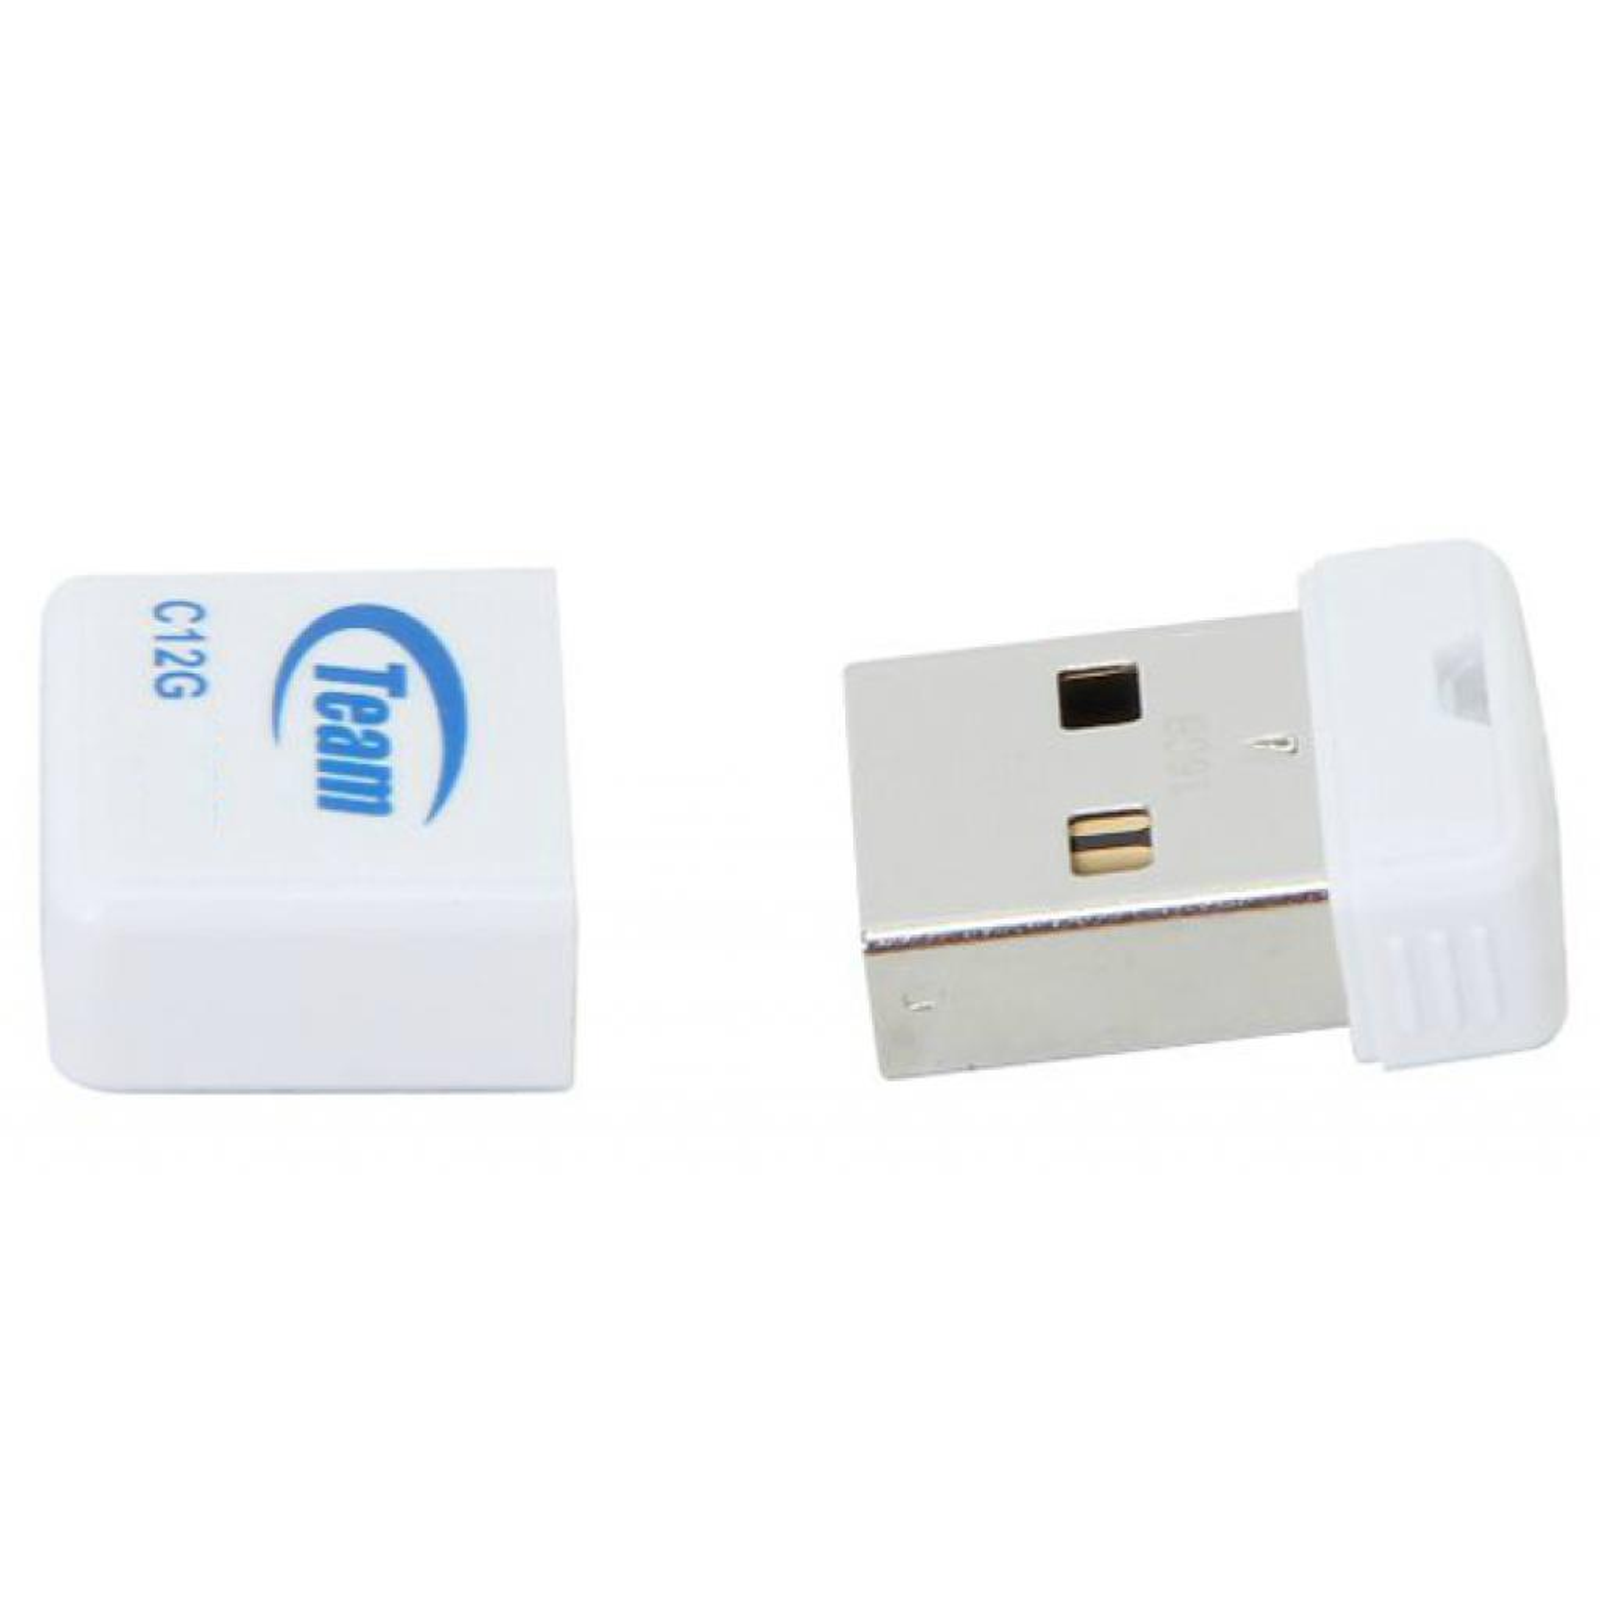 USB флеш накопитель Team 32GB C12G Black USB 2.0 (TC12G32GB01) изображение 3